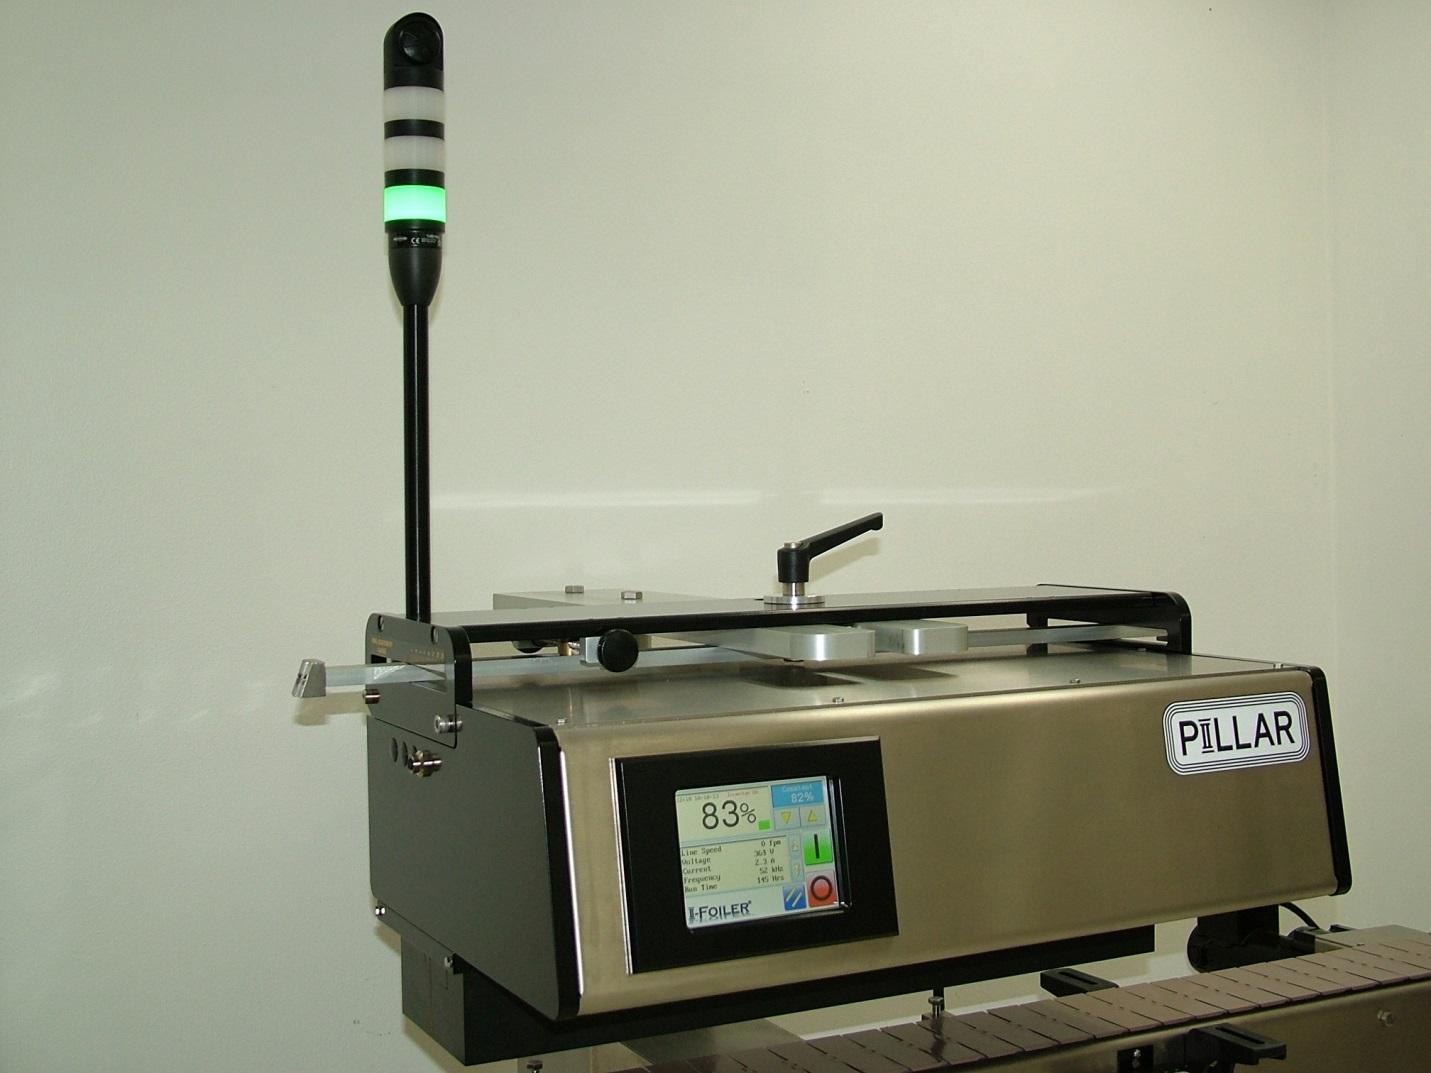 PILLAR Induction Sealers